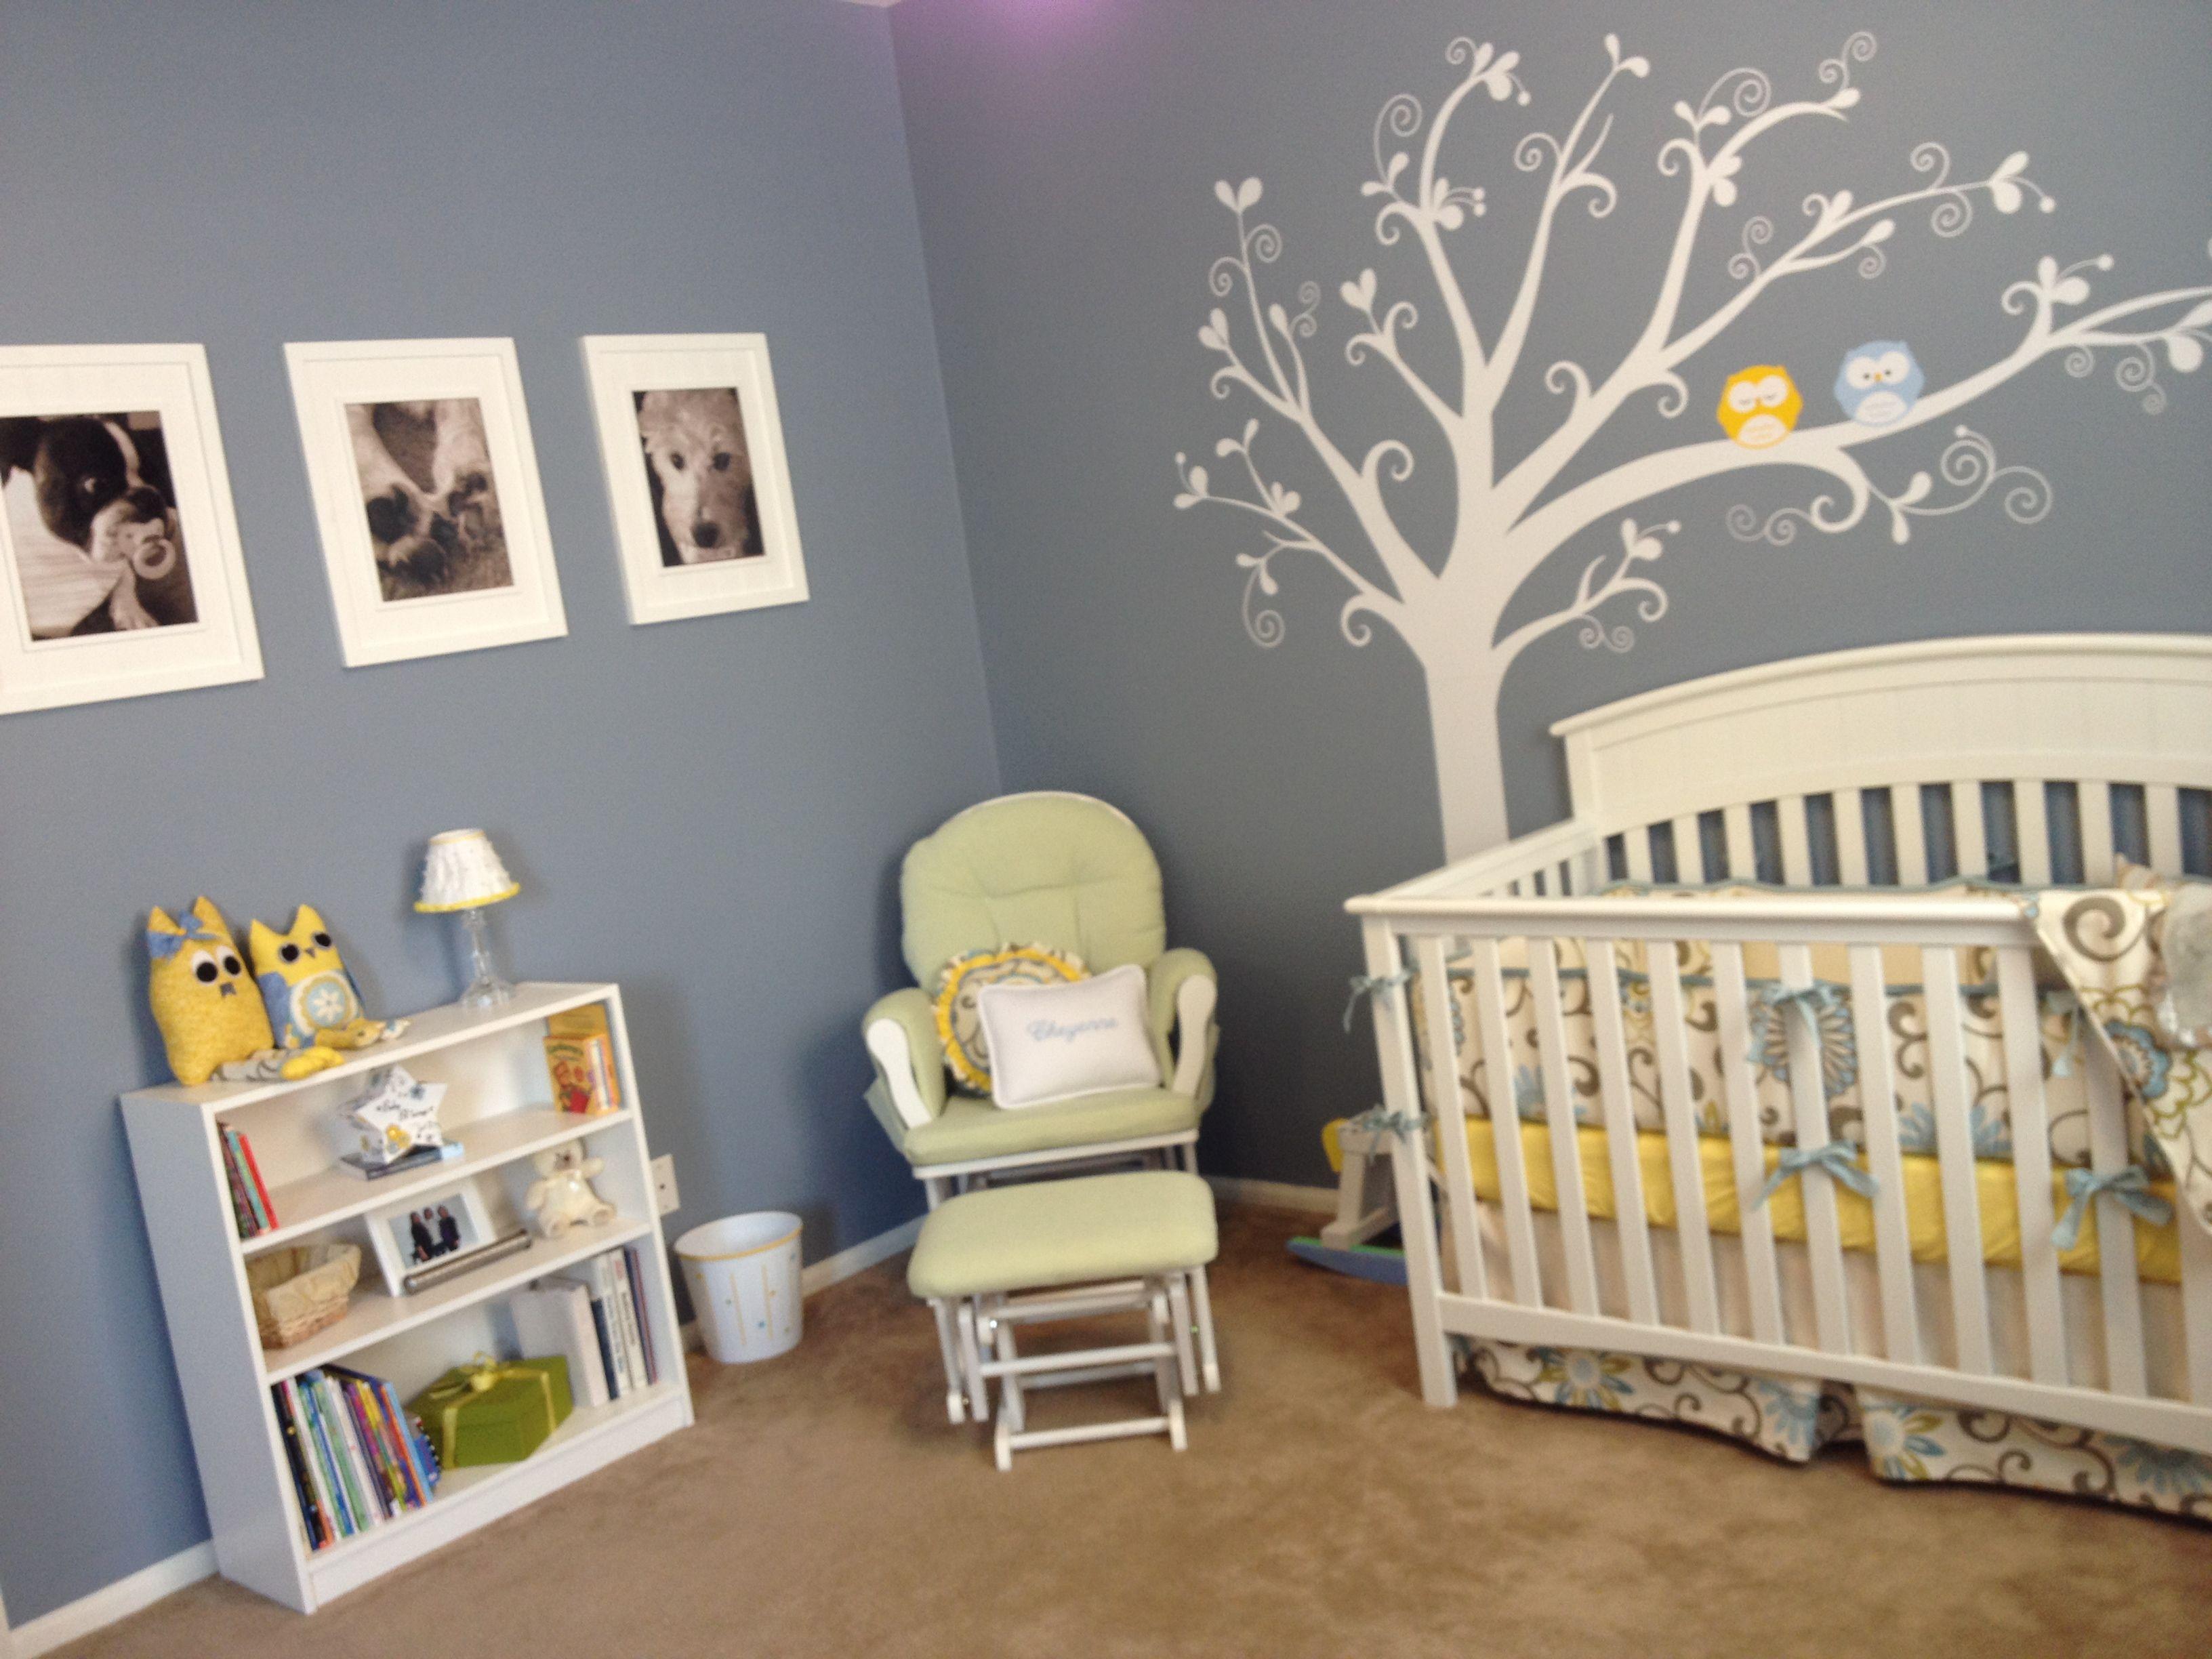 My Baby Girl S Nursery: My Niece's Nursery. I Love That Her Mom Didn't Use The